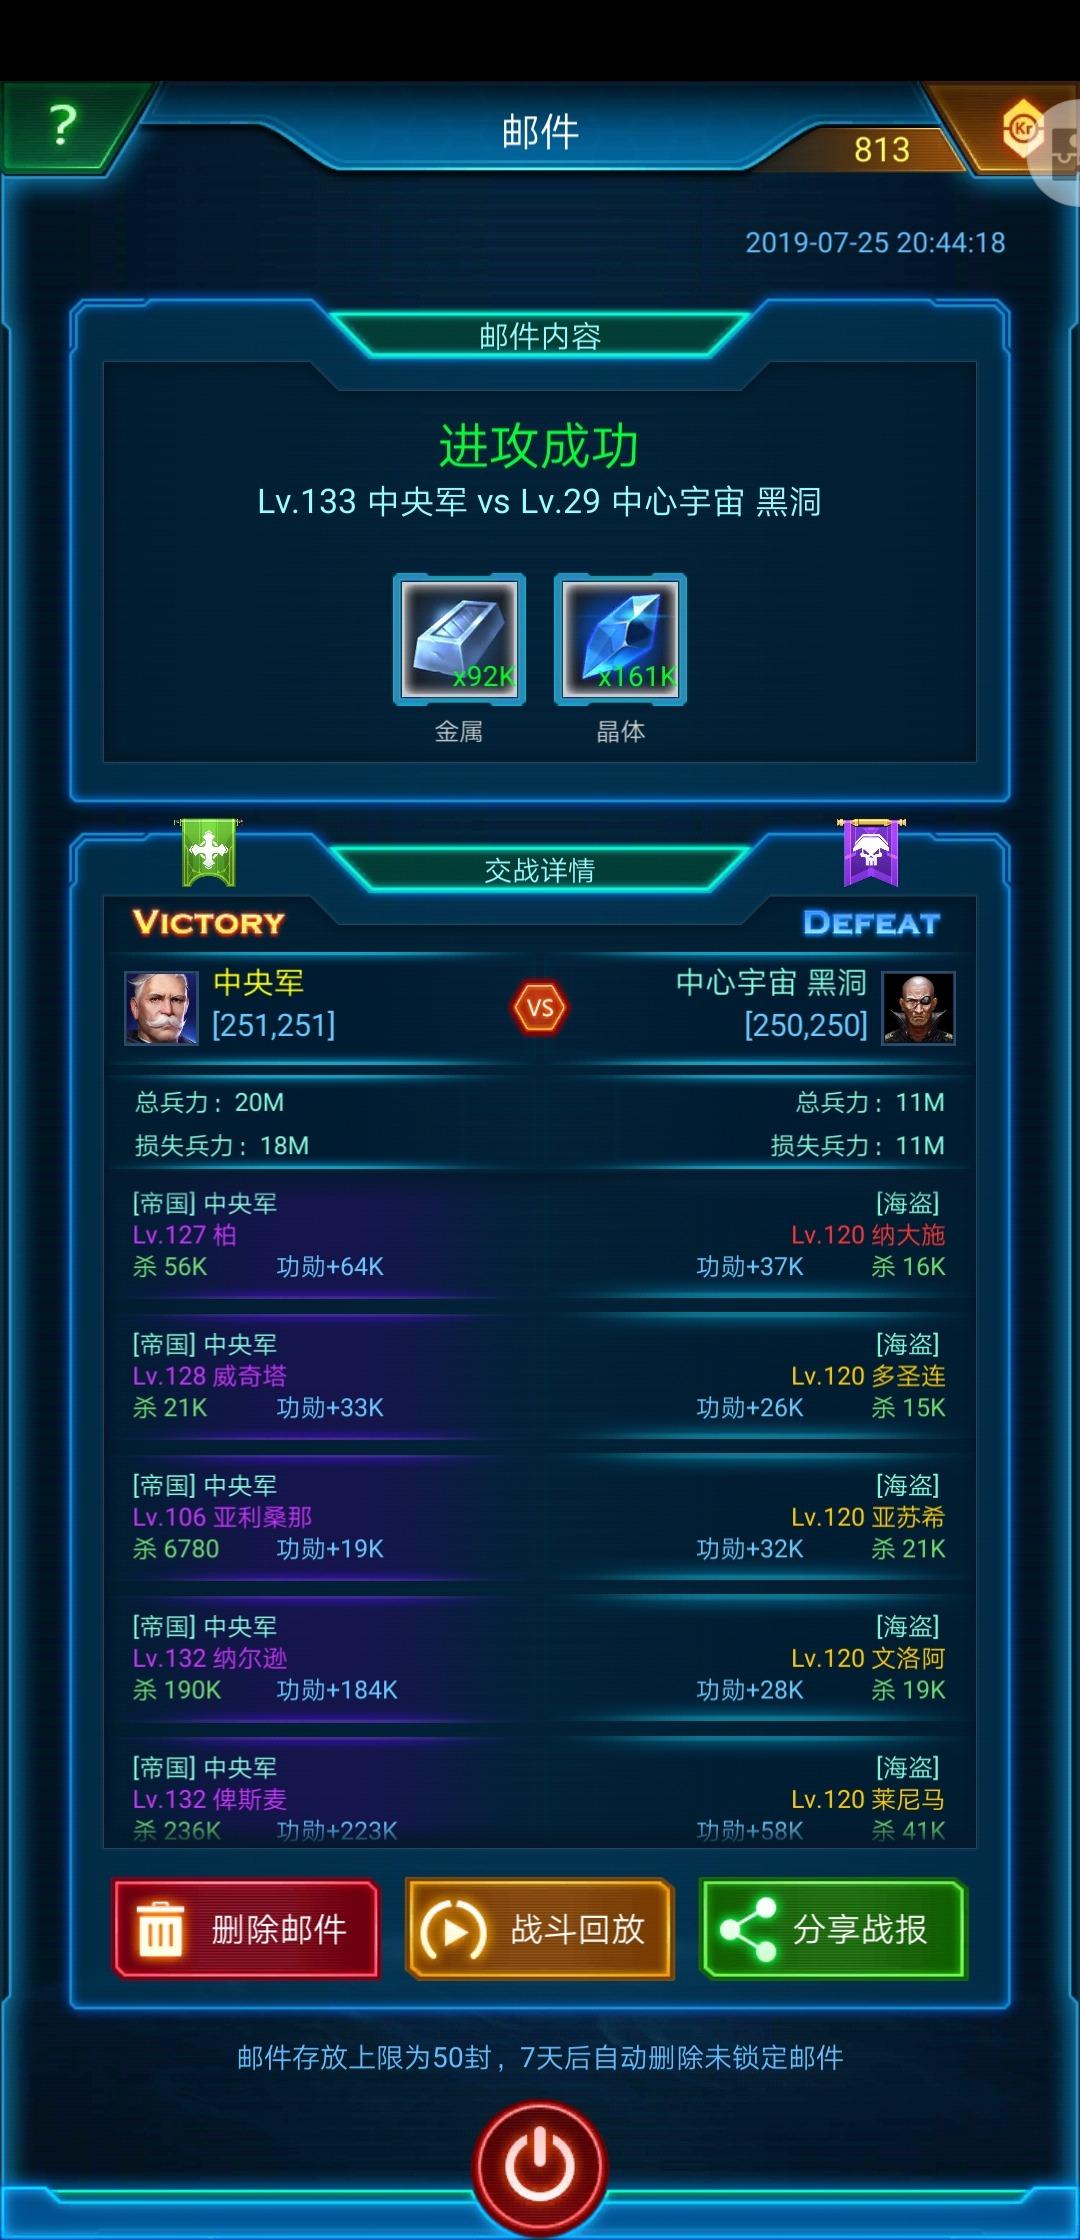 Screenshot_20190725_204706_com.jedigames.p16s.huawei.jpg